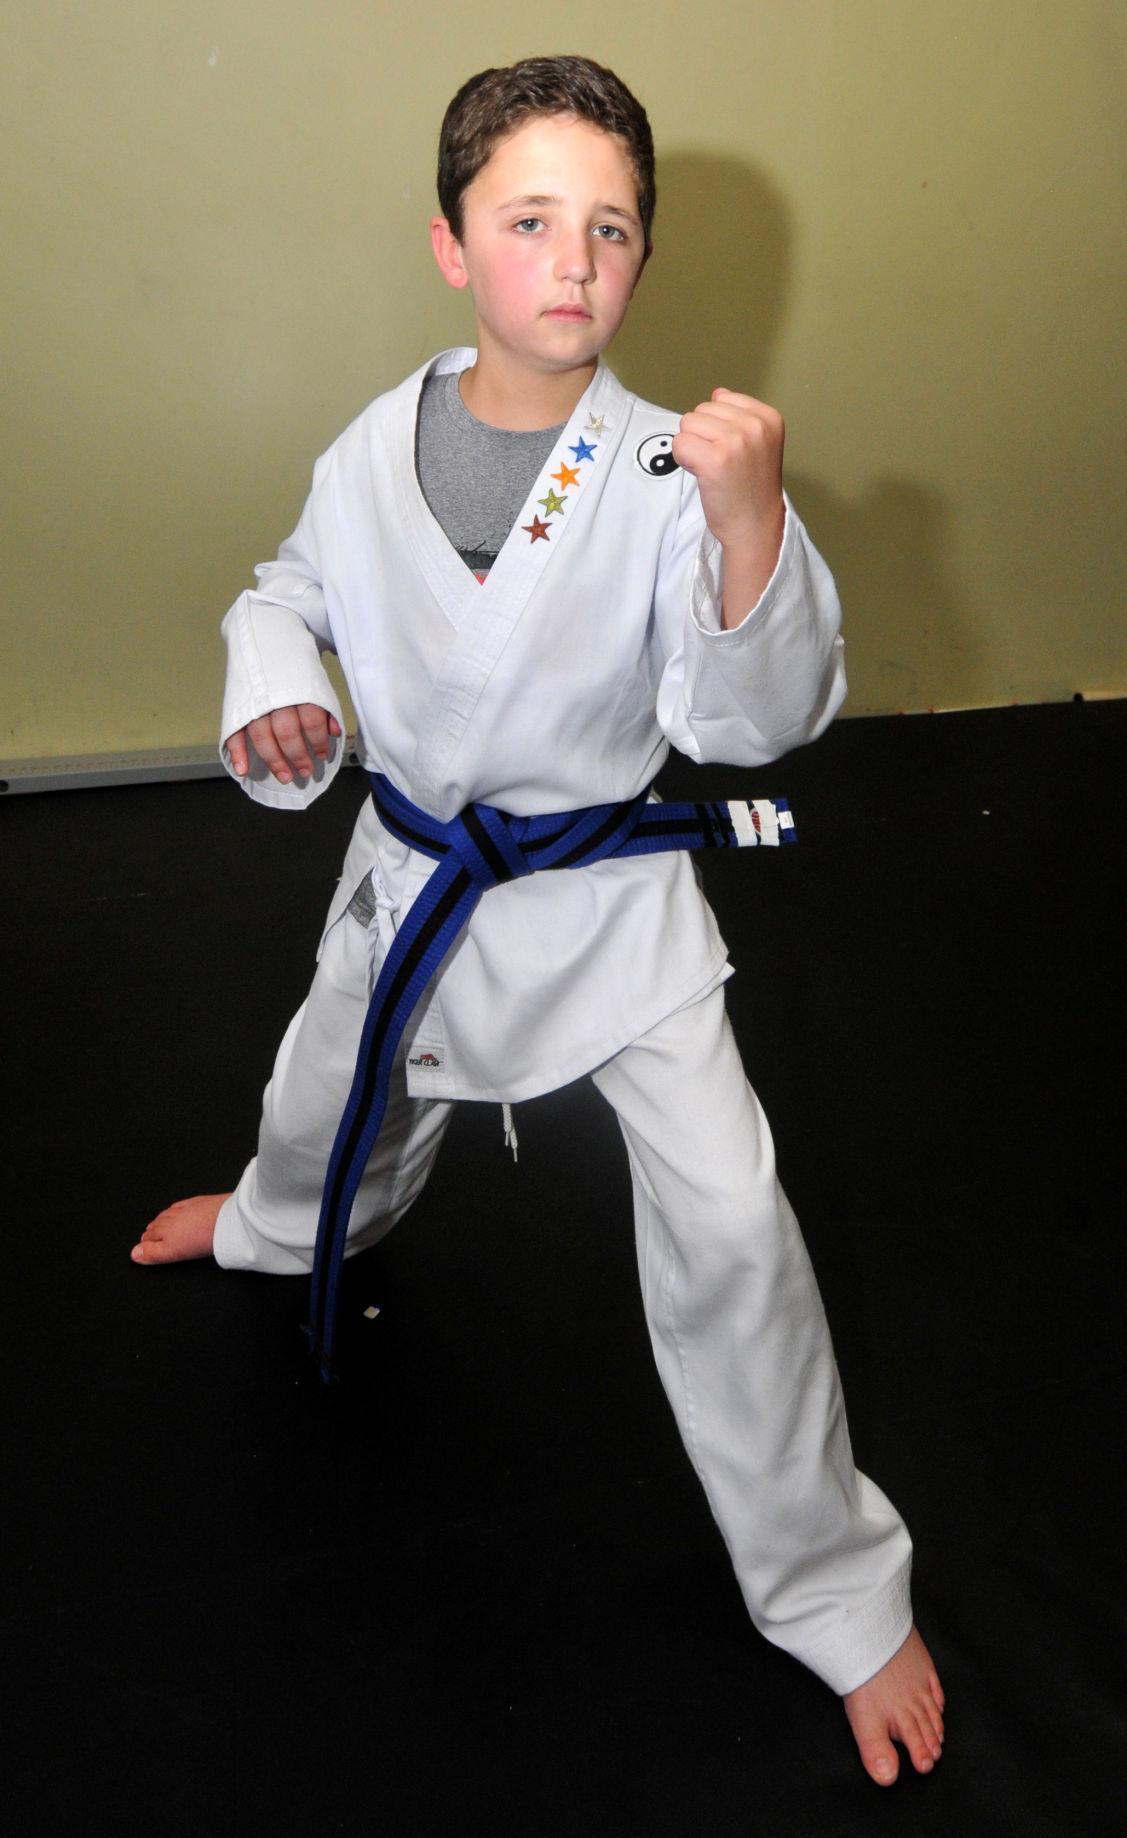 Chase strikes an intimidating karate pose post-stroke.  Photograph by Carl Kosola